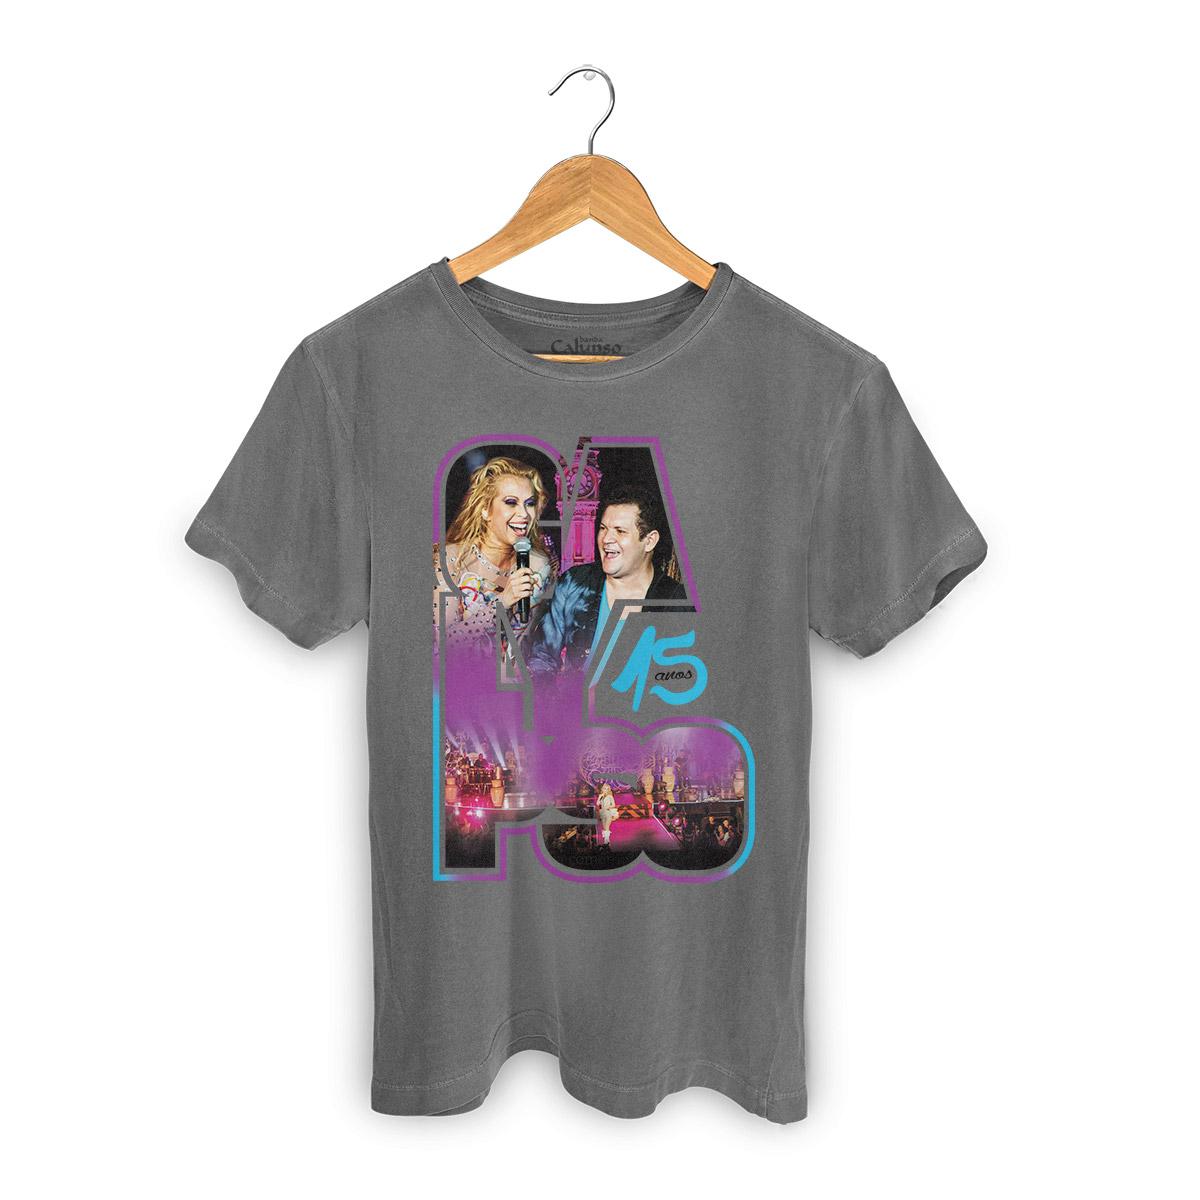 T-shirt Premium Masculina Calypso 15 Anos Foto